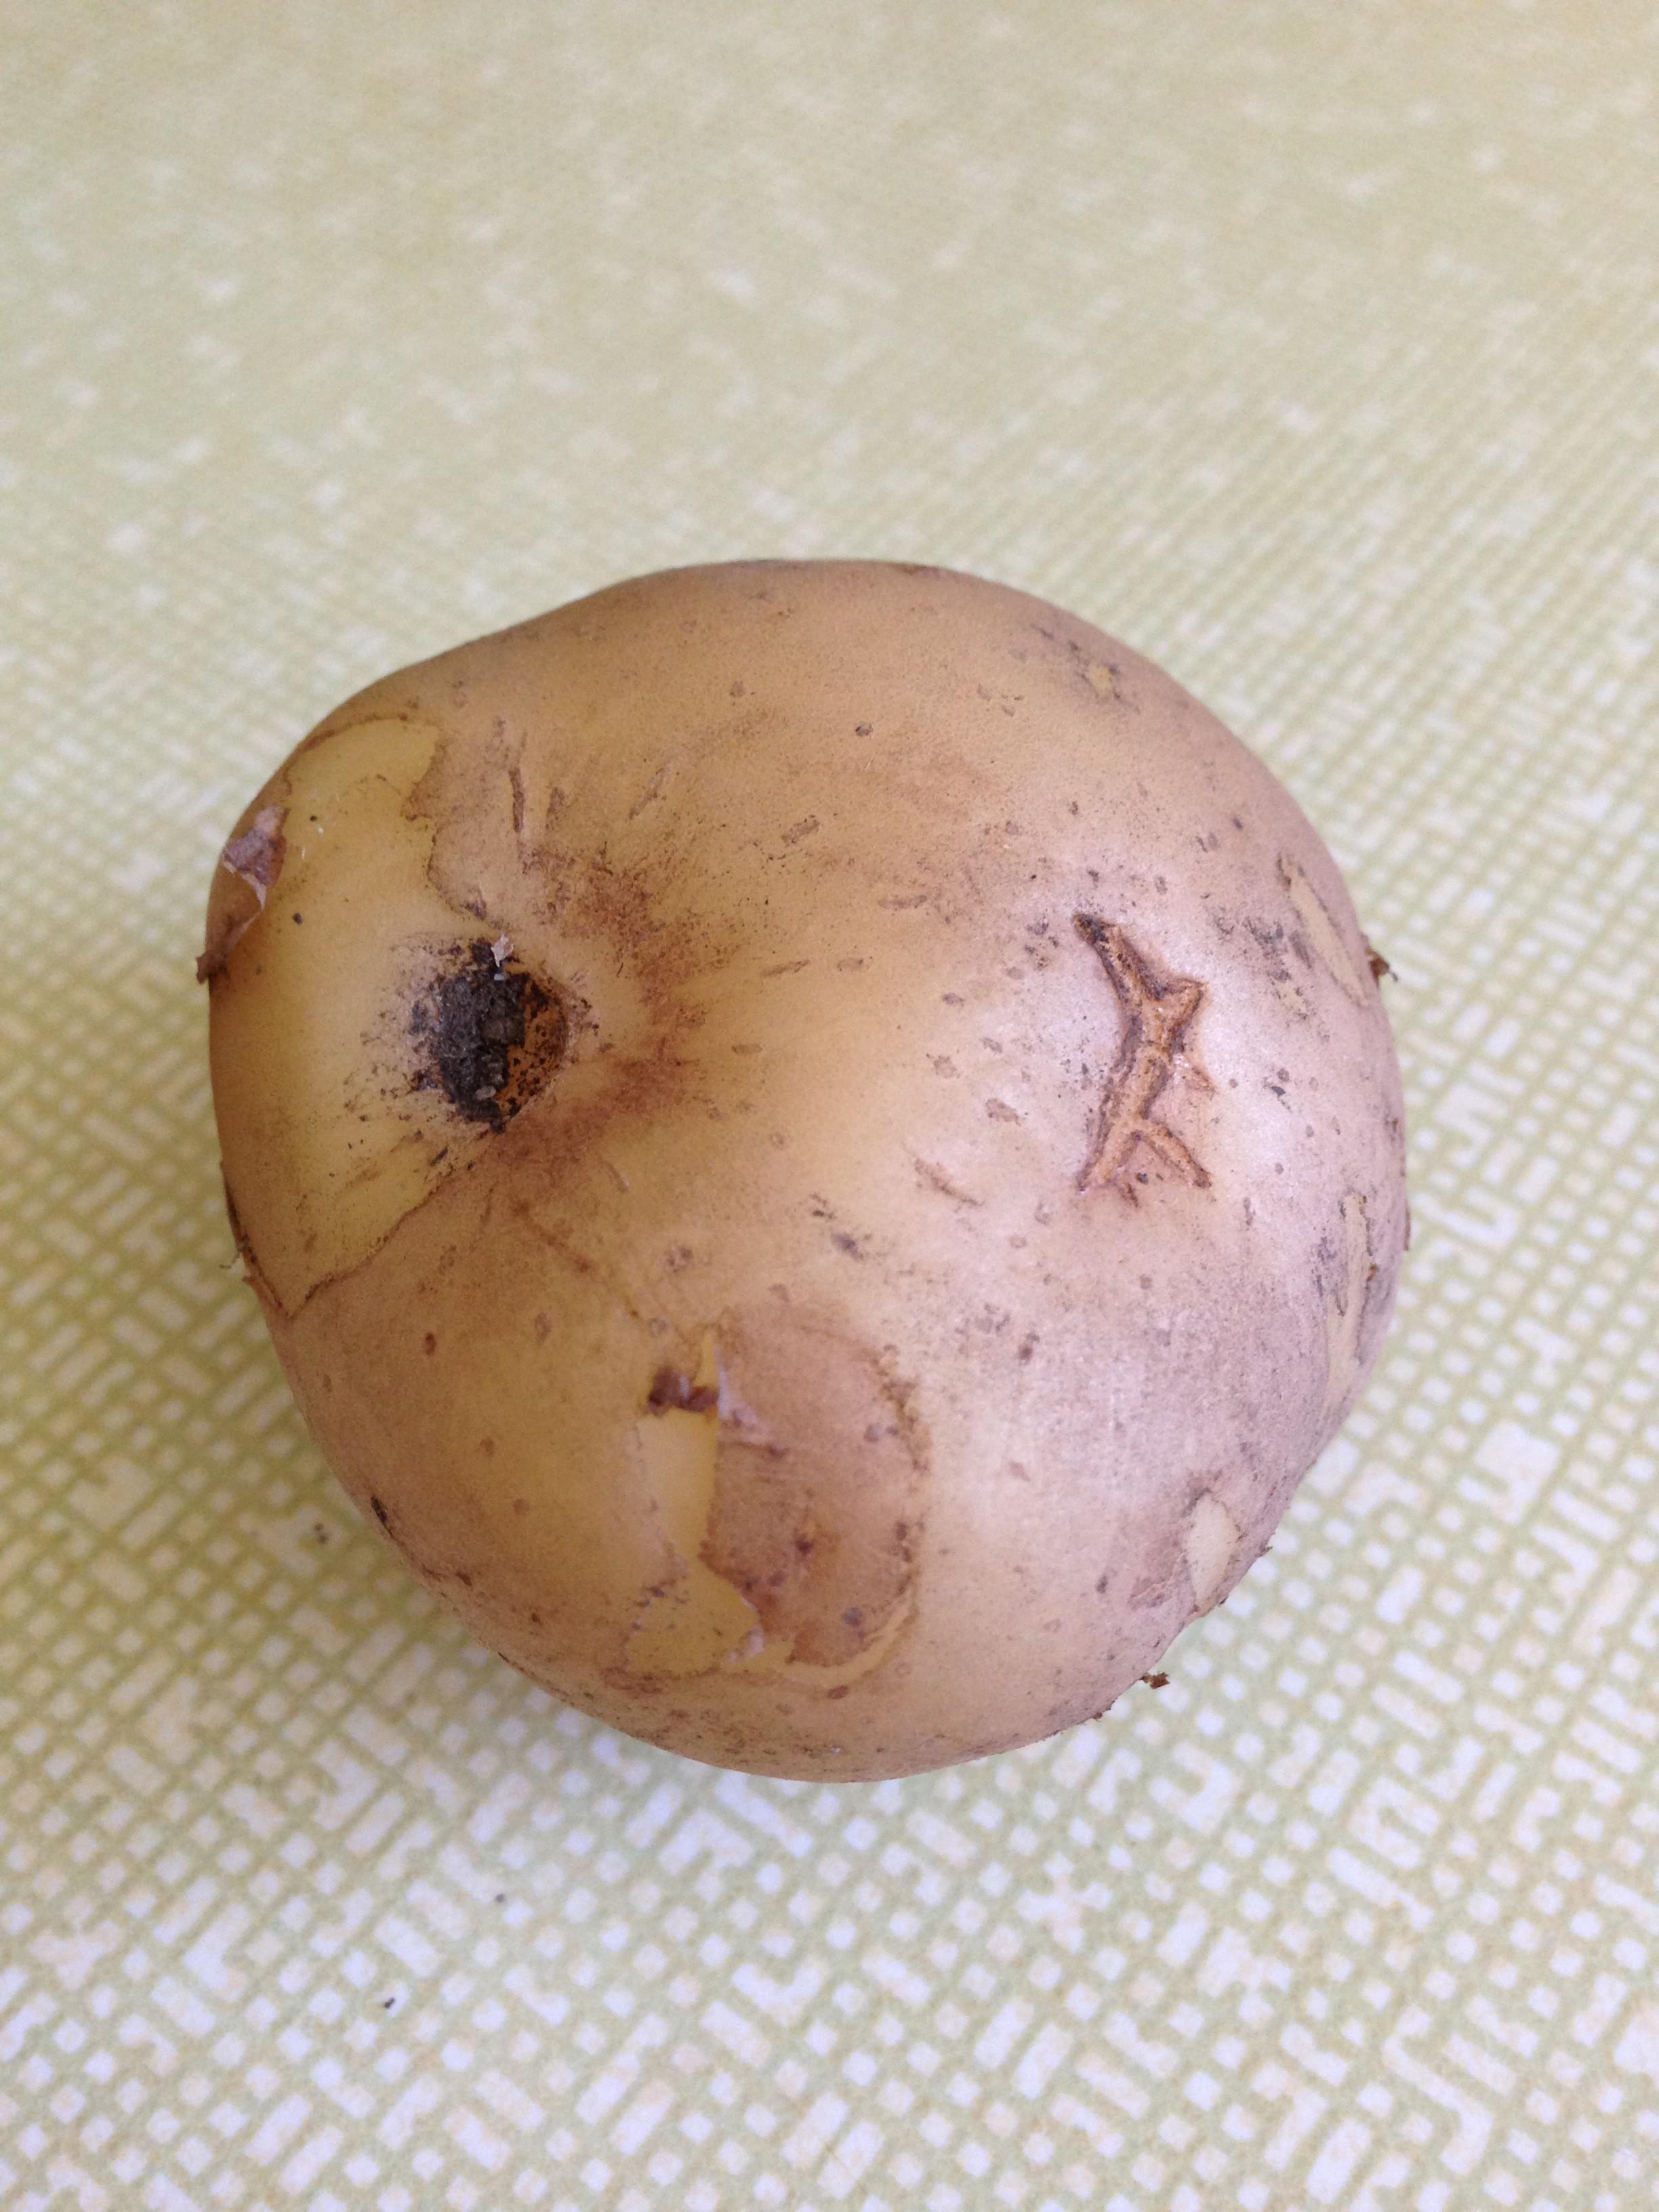 One potato…